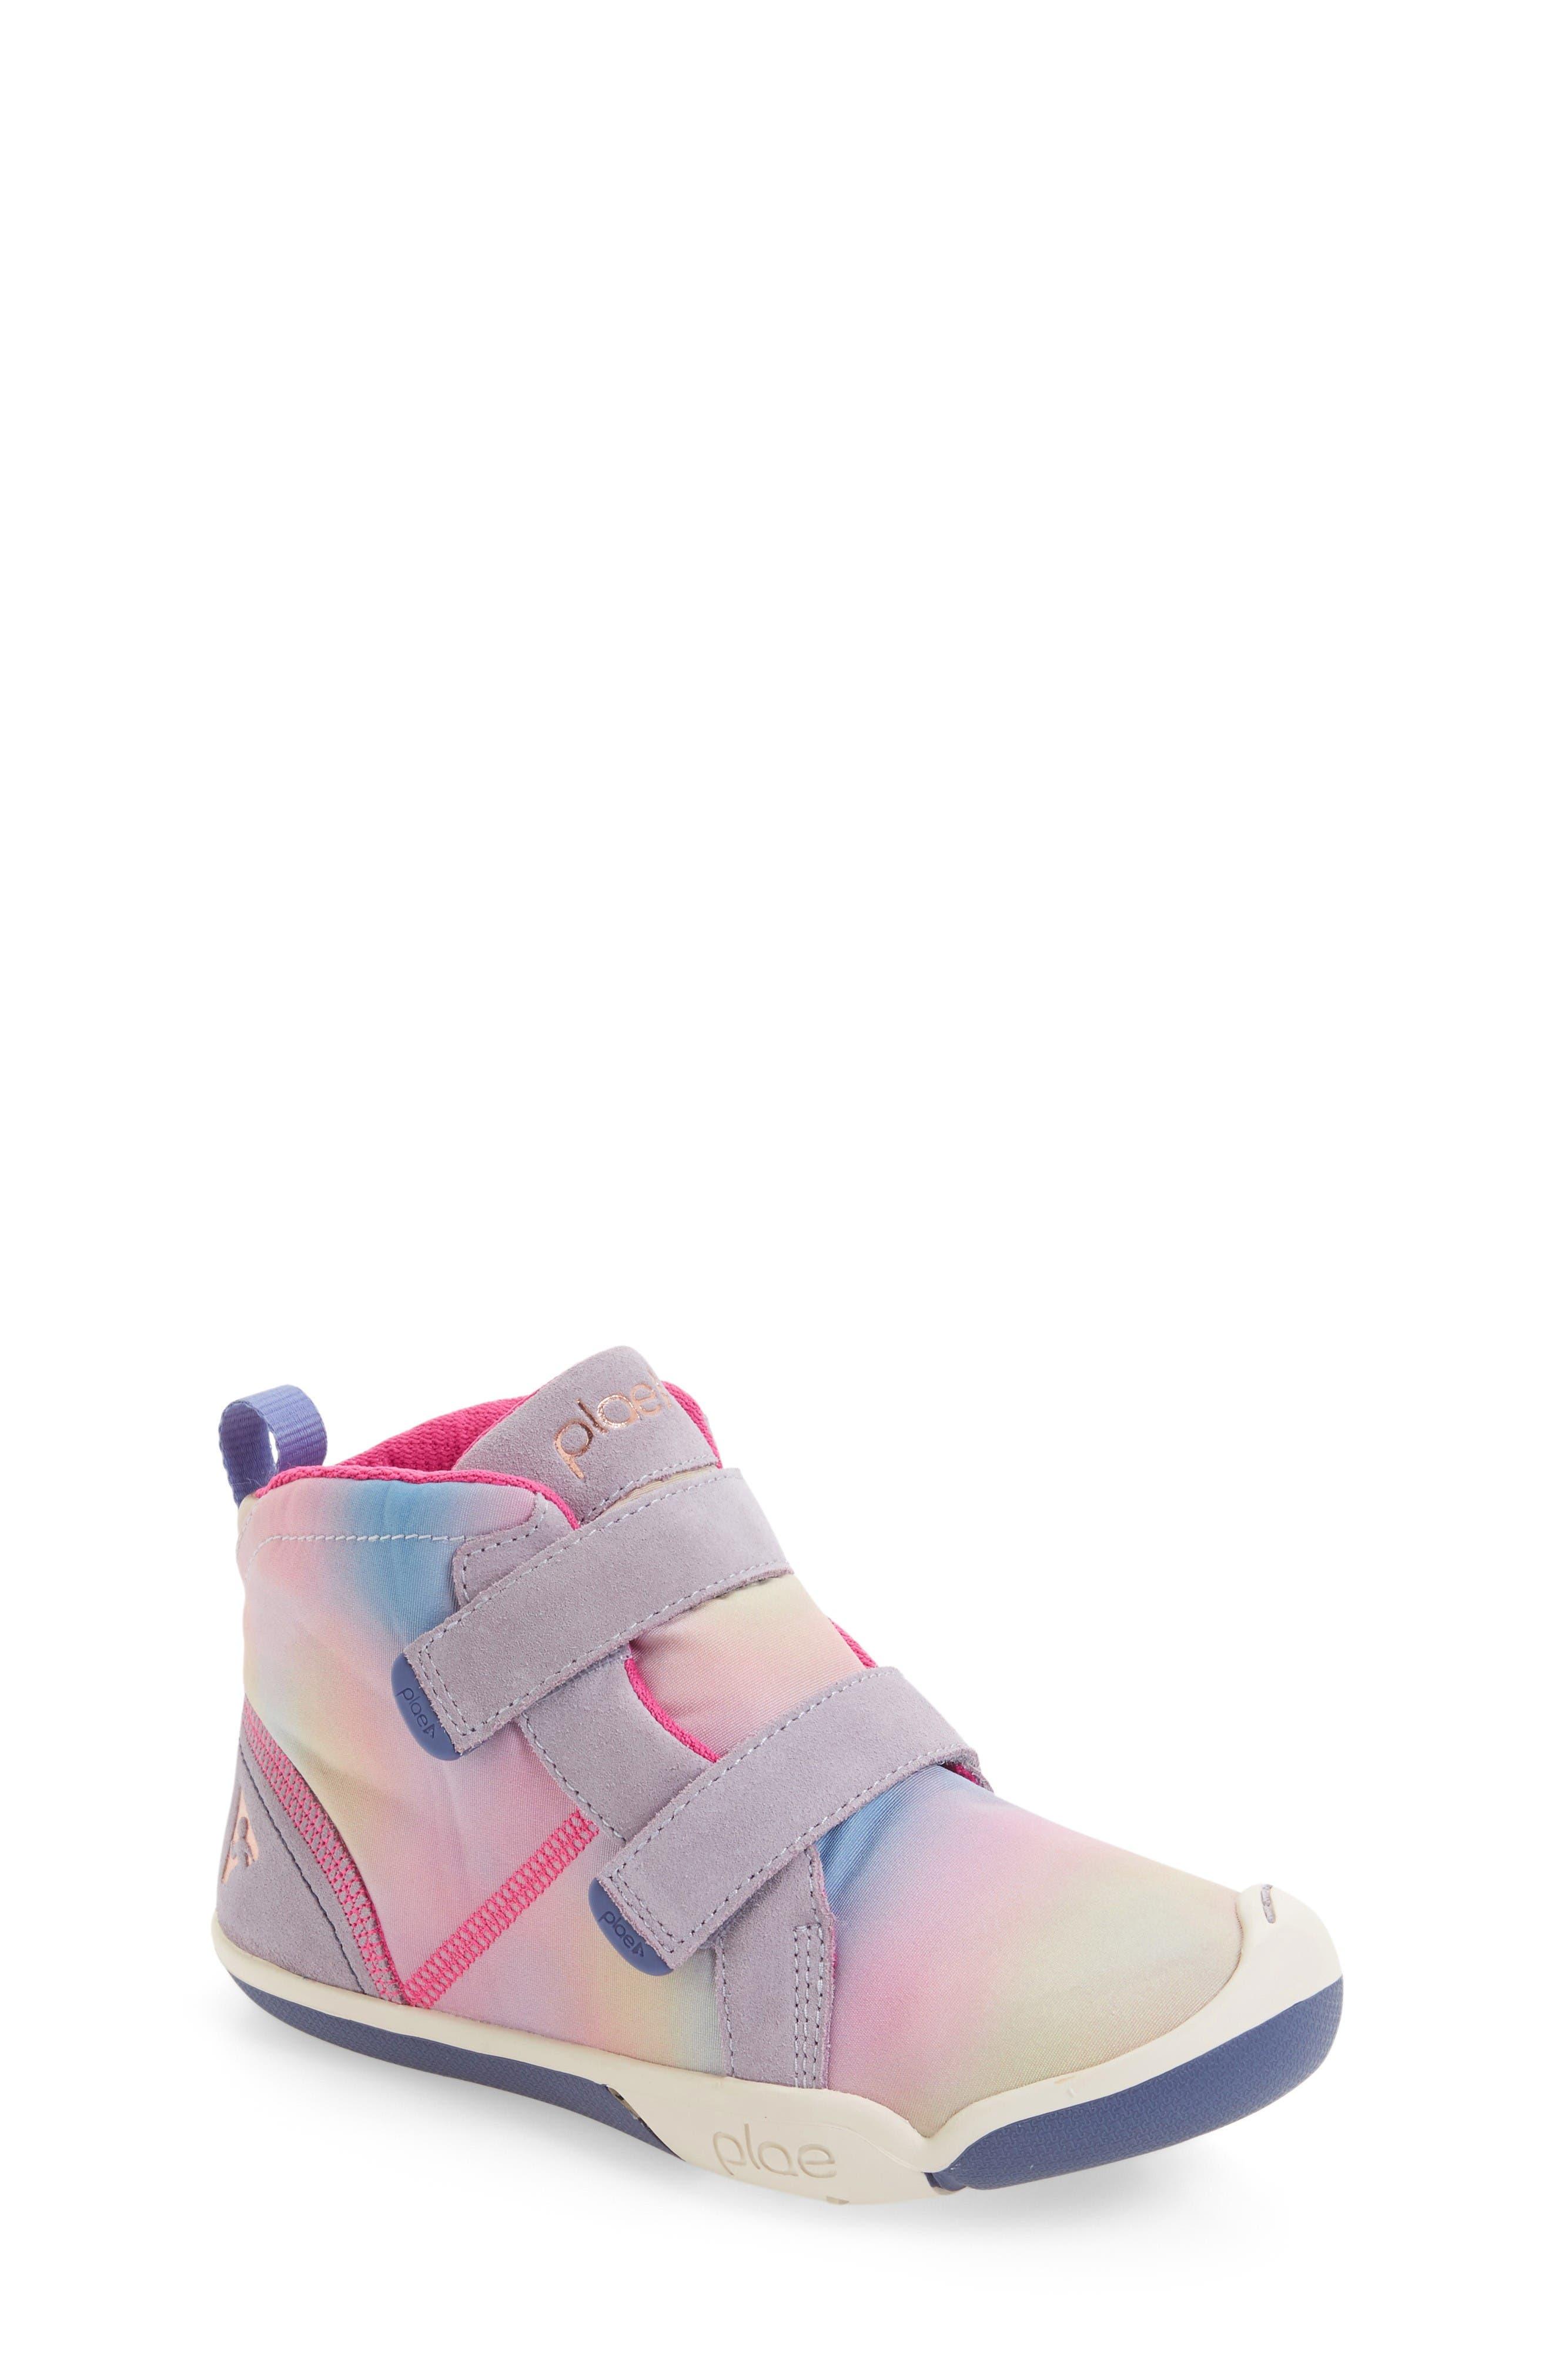 Max Customizable High Top Sneaker,                         Main,                         color, Fun Aurora Suede